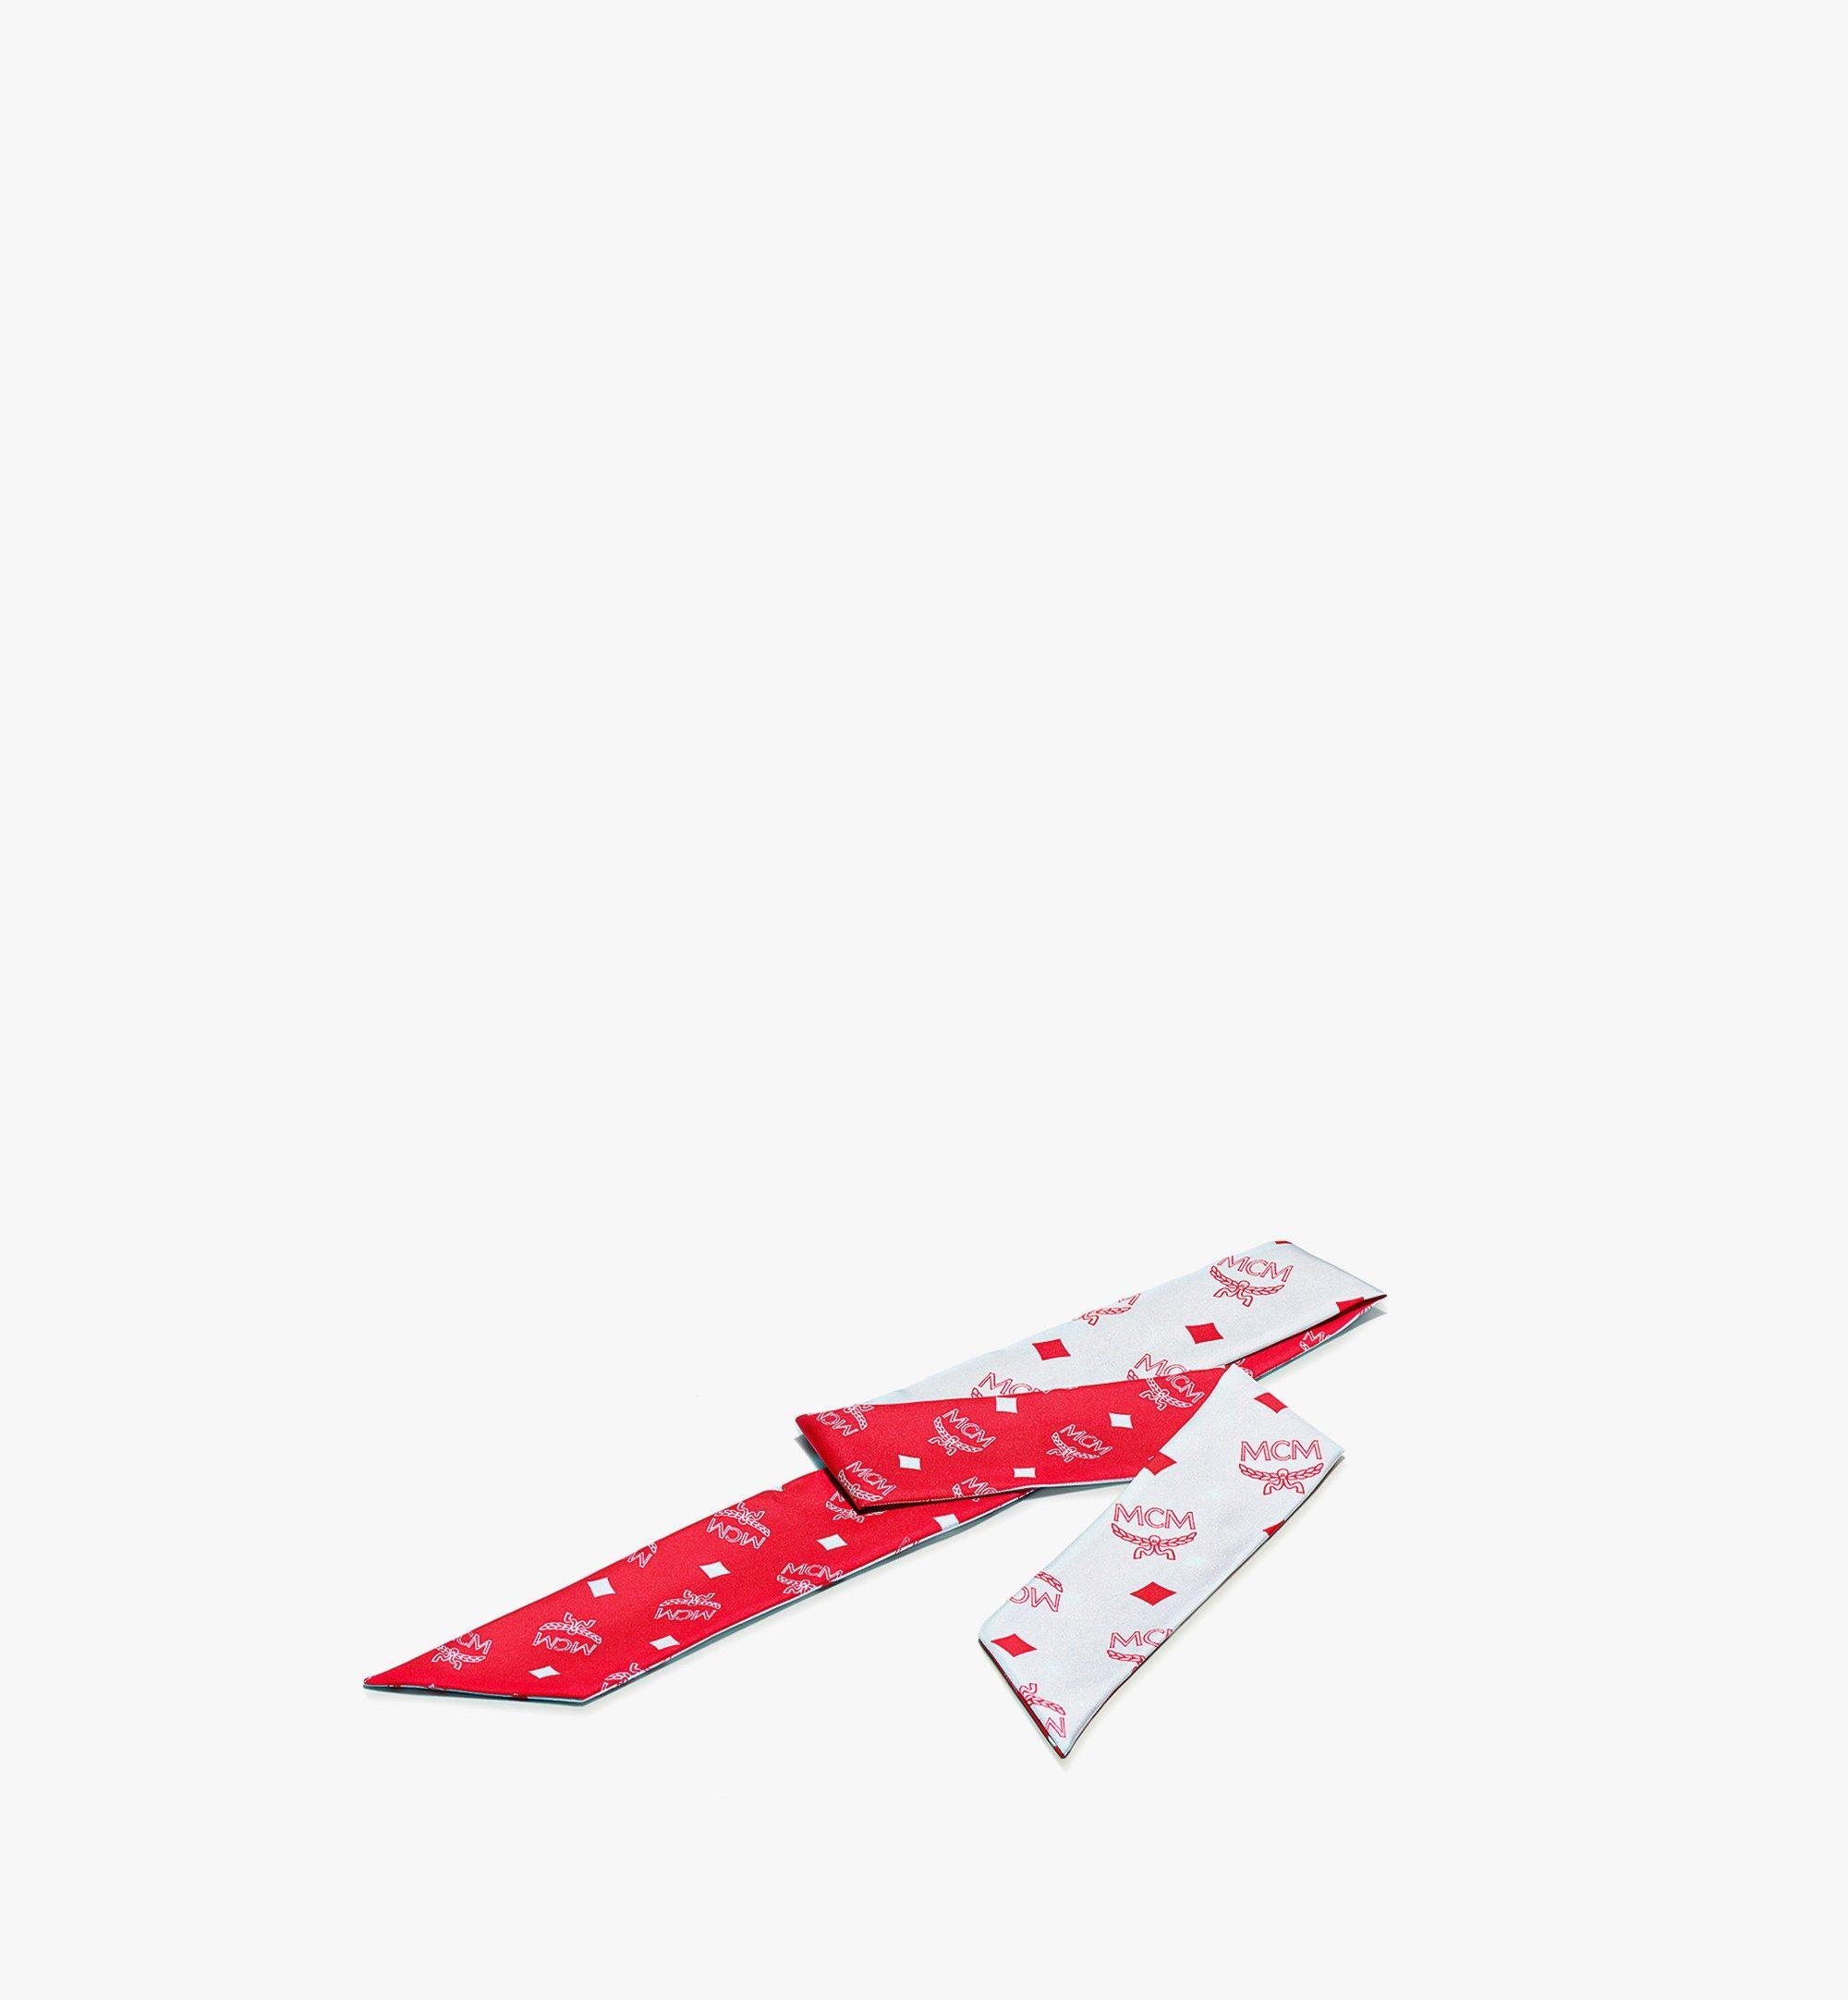 MCM 花押字圖案真絲斜紋圍巾 Red MEFBSMM12R4001 更多視圖 1